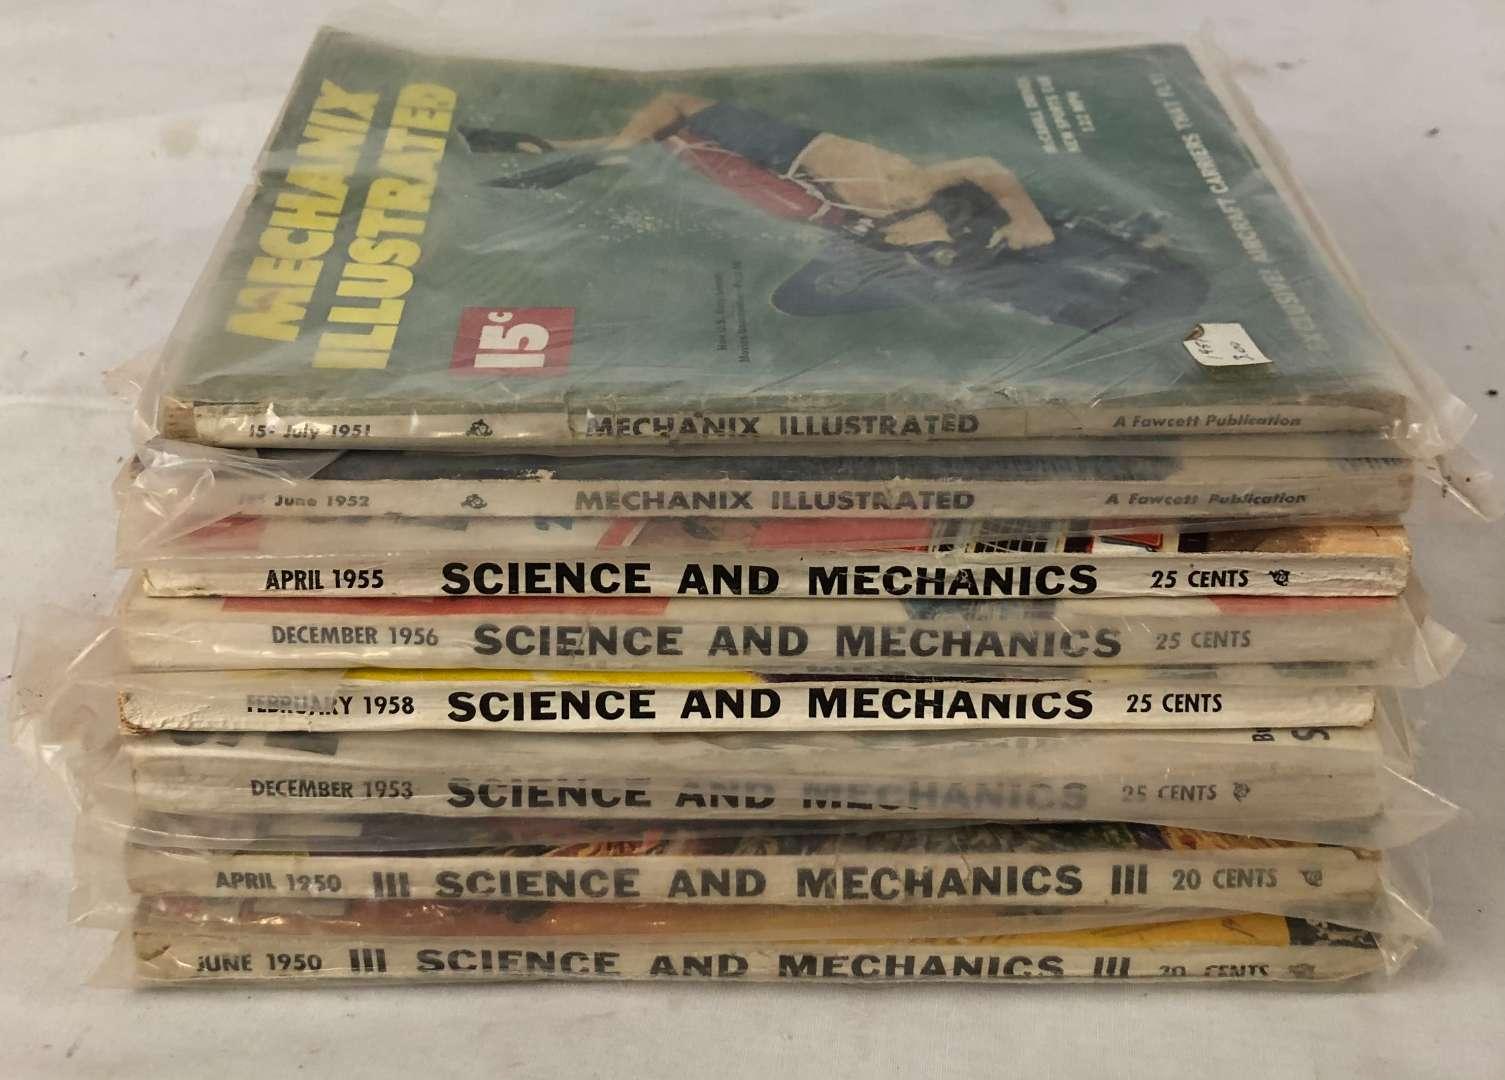 Lot # 149 - Lot of Vintage 1950's Science and Mechanics, Mechanix Illustrated Magazines (main image)